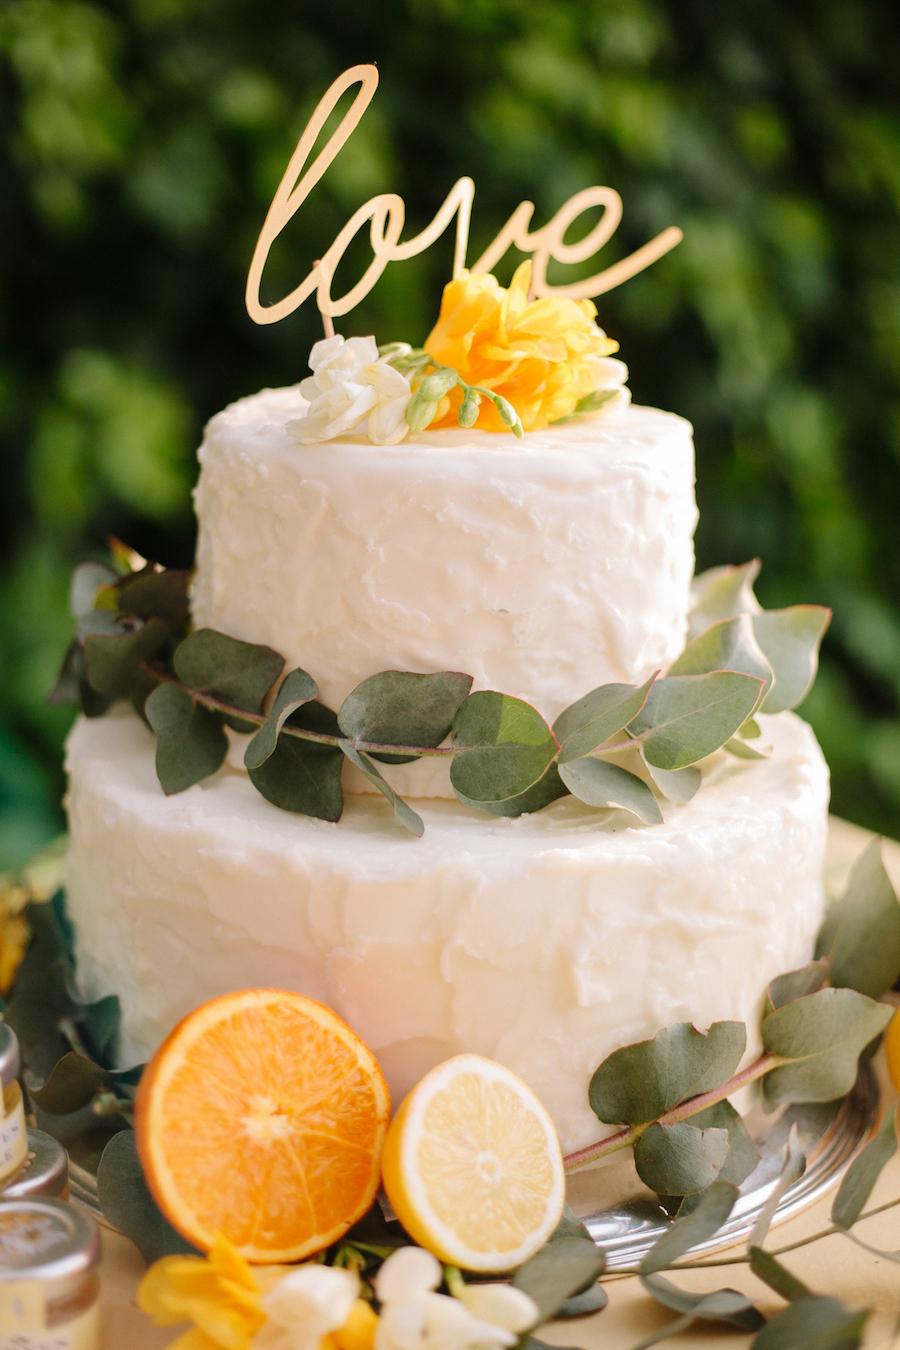 torta decorata con eucalipto e agrumi